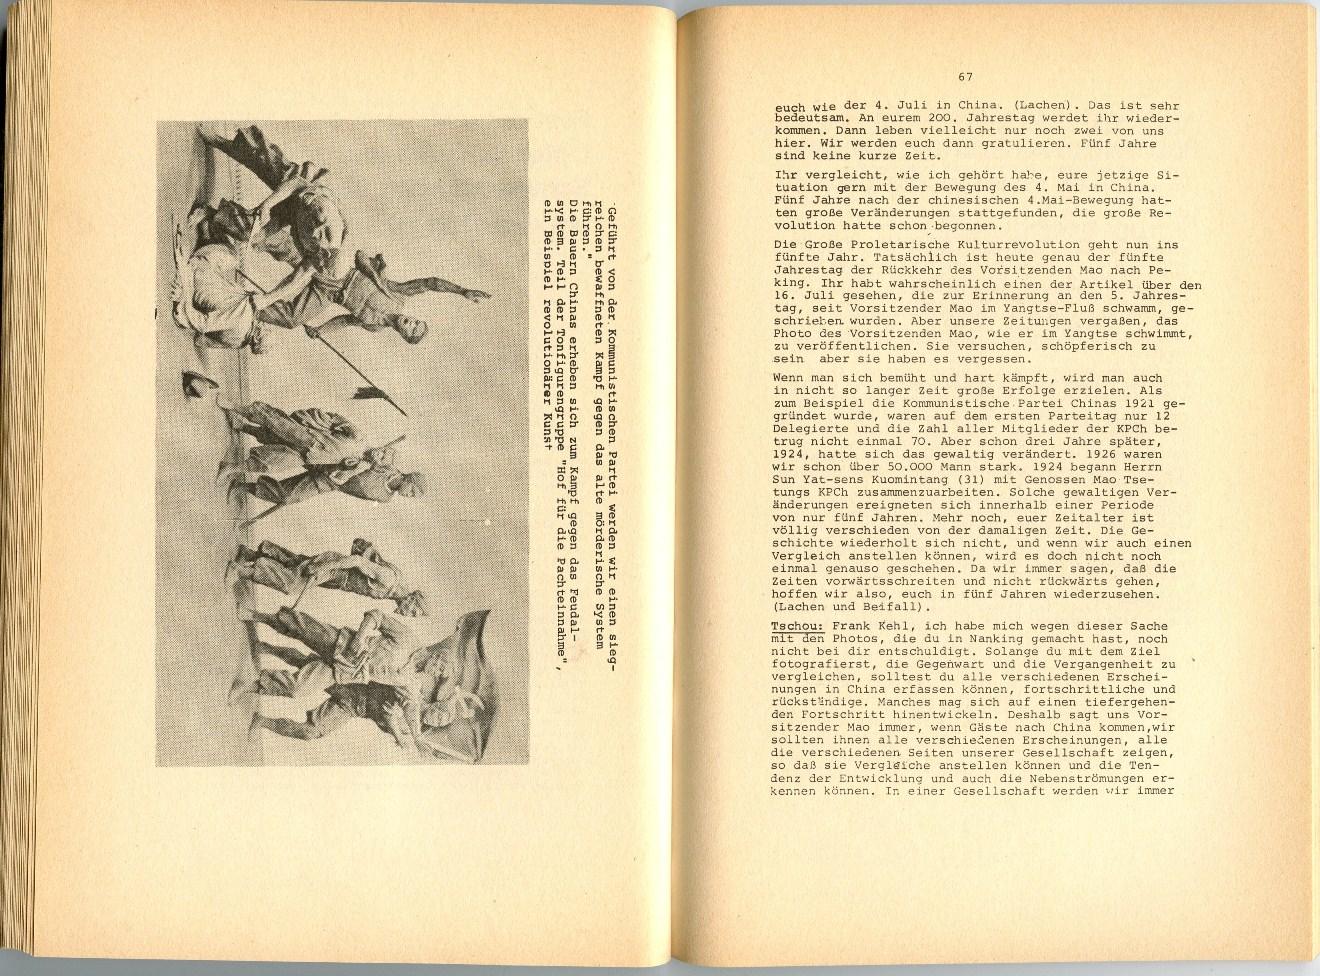 ZB_VRChina_Bollwerk_1971_35